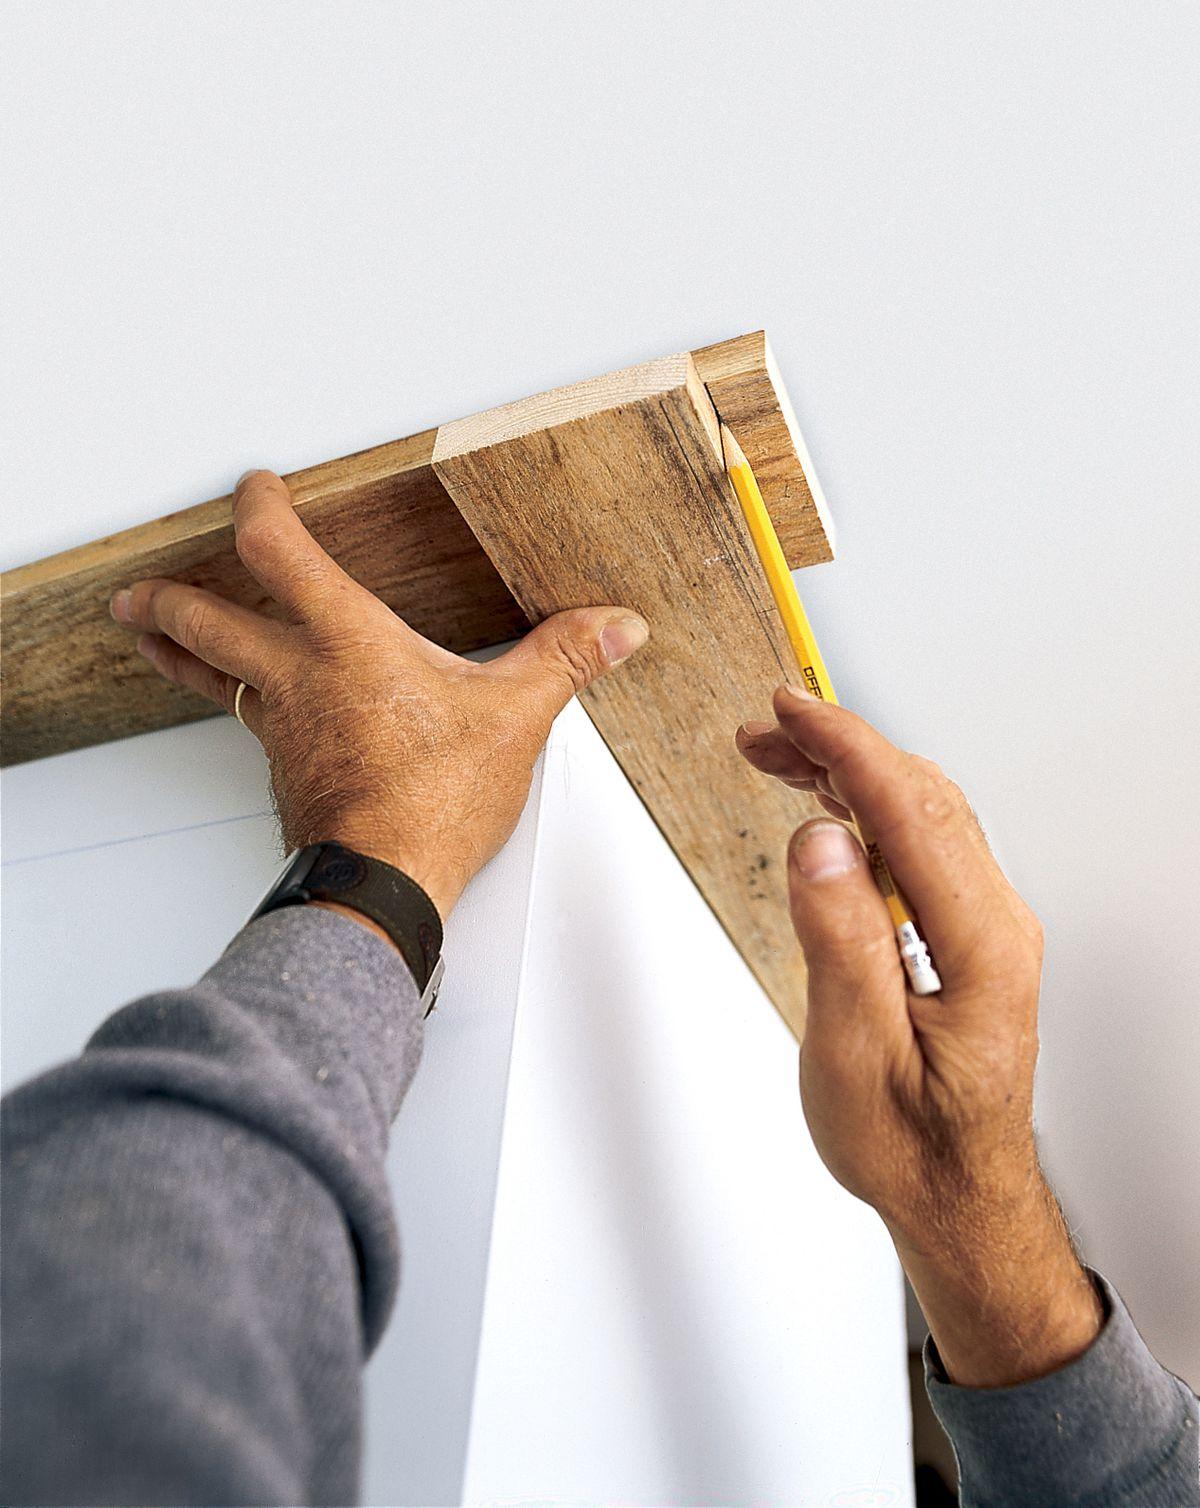 Determining the corner of crown molding